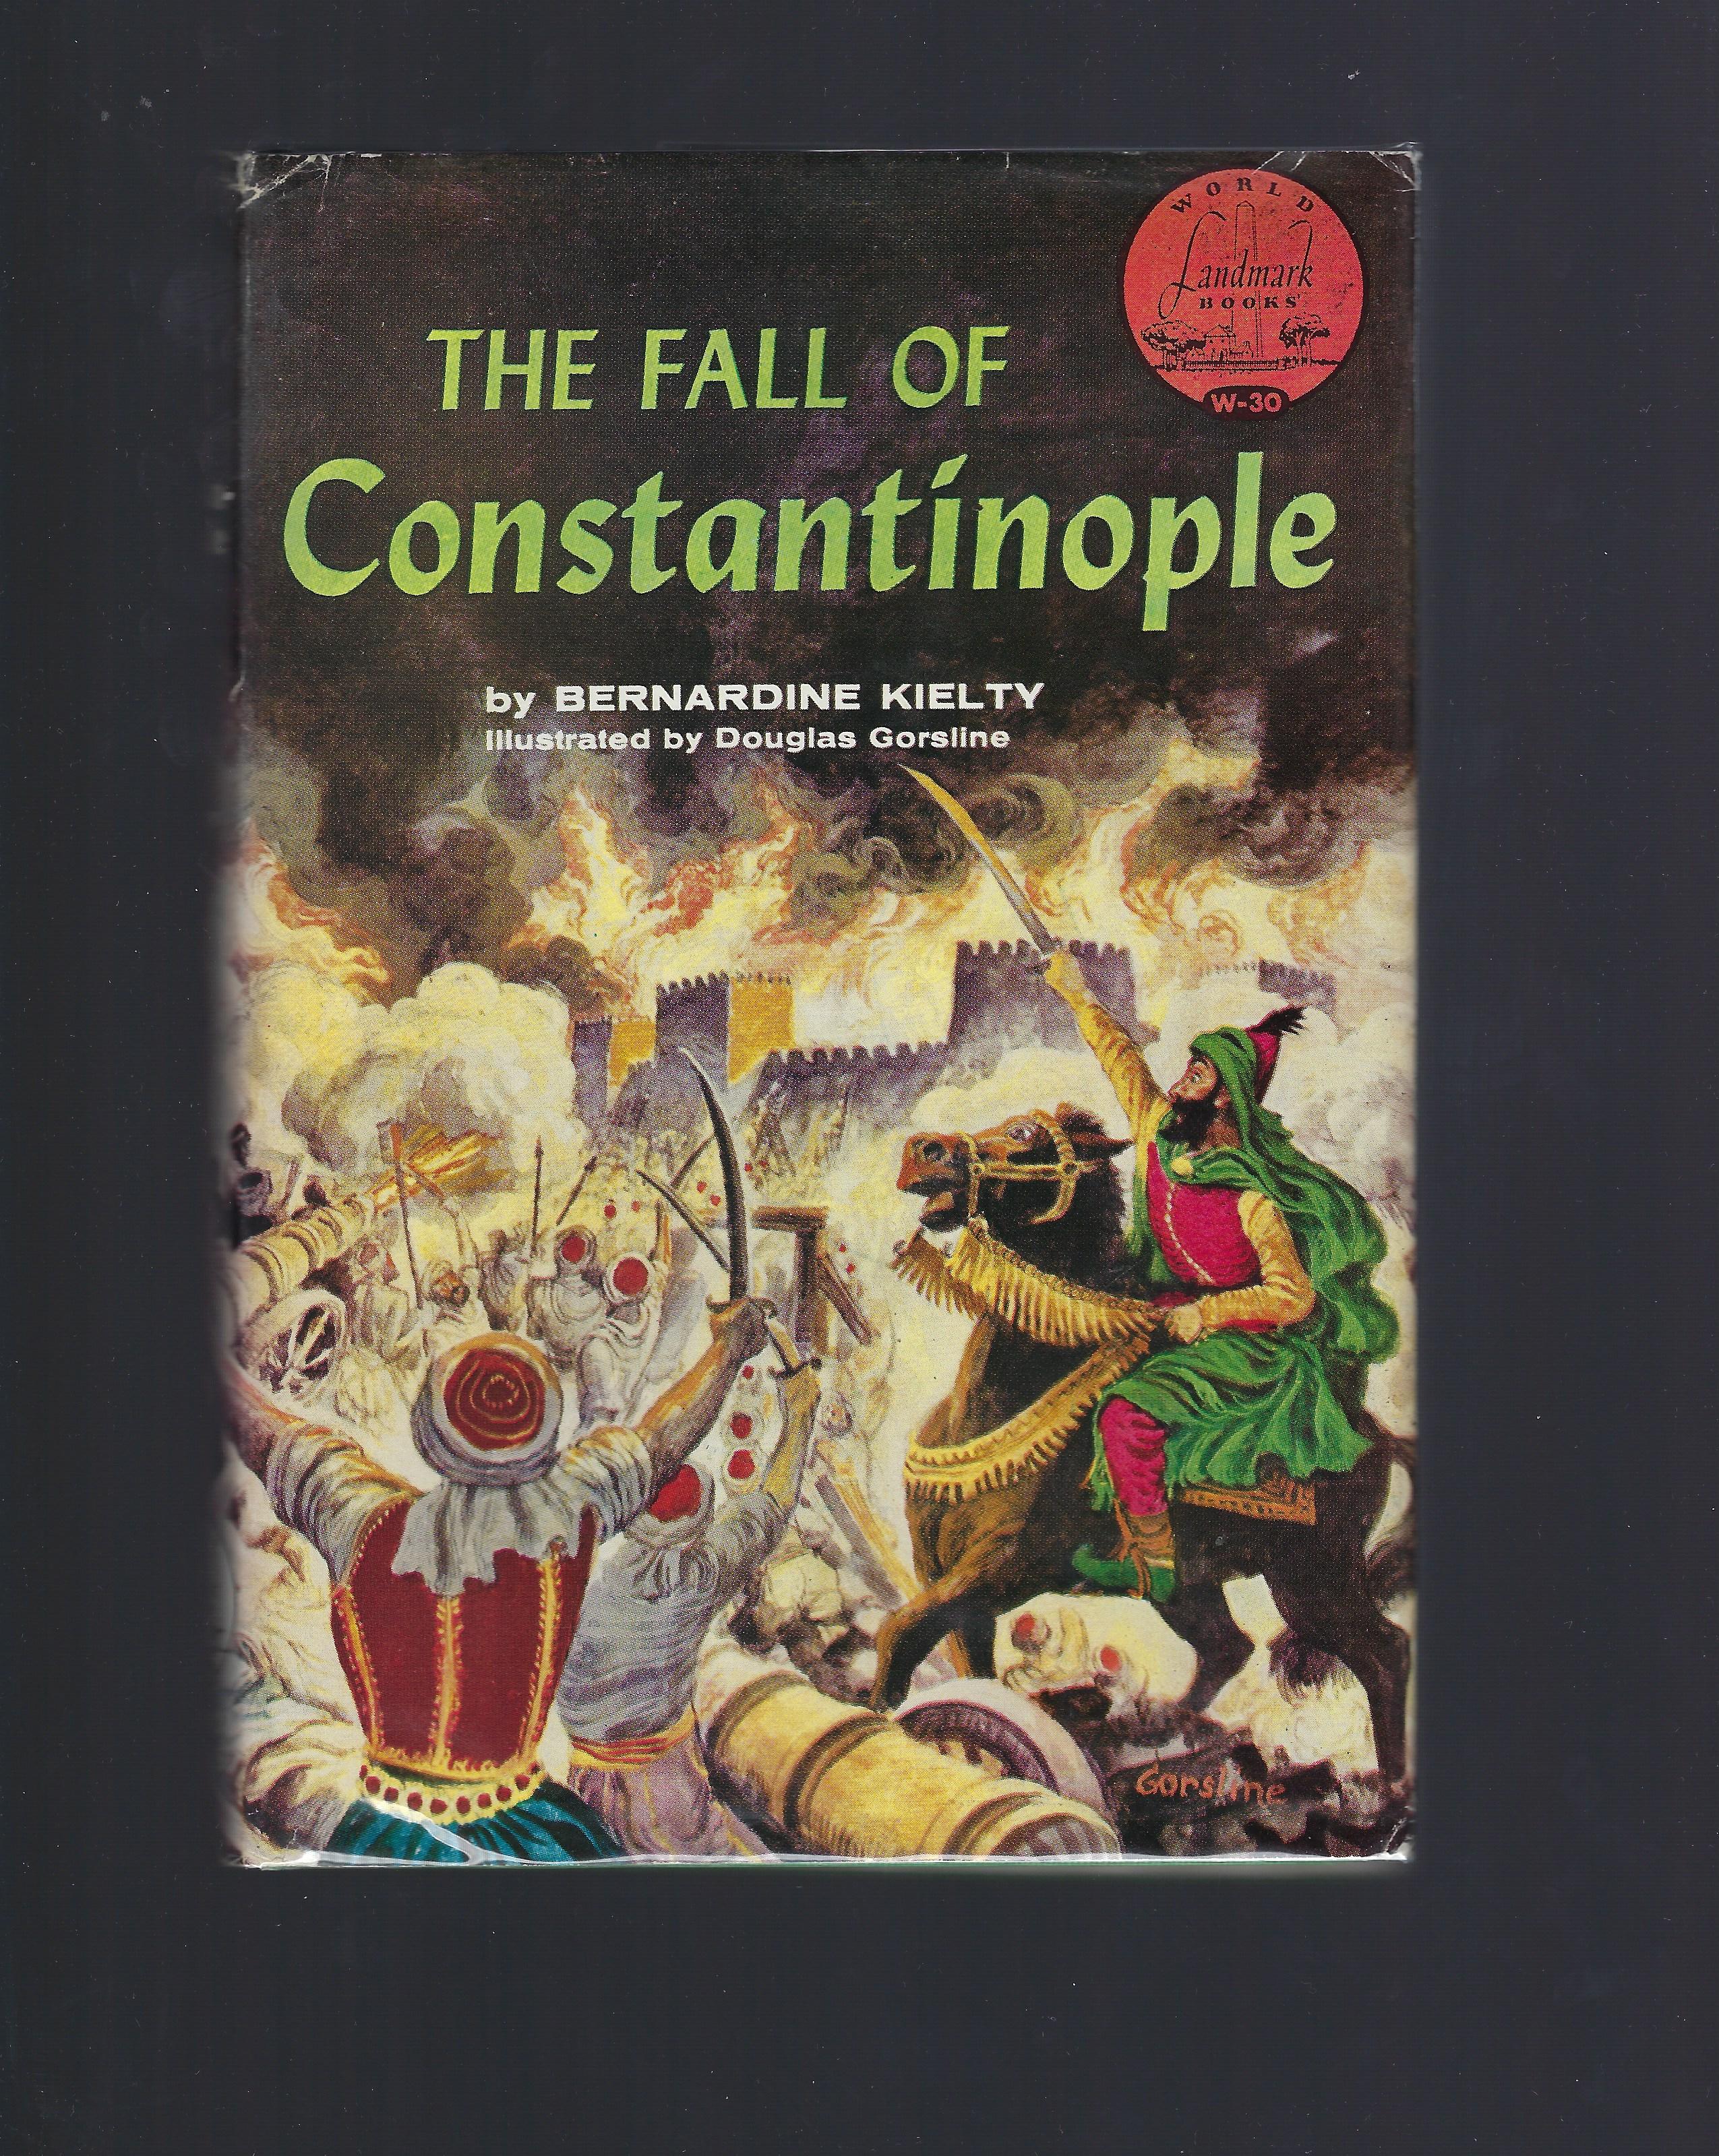 The Fall of Constantinople Landmark First Printing HB/DJ, Bernardine Kielty; Illustrator-Douglas Gorsline